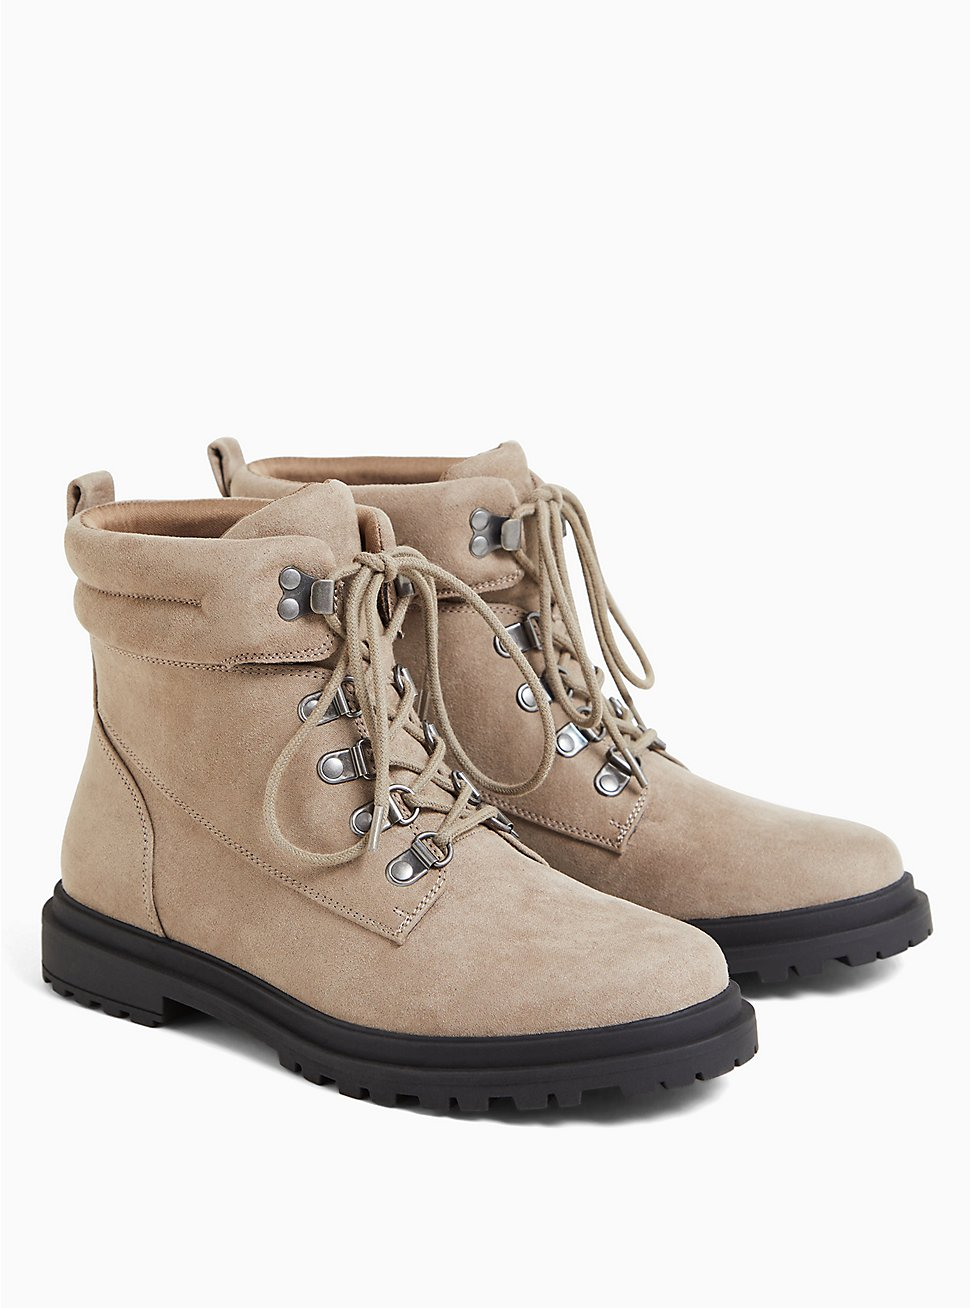 Beige Faux Suede Hiker Lug Boot (WW), TAN/BEIGE, hi-res